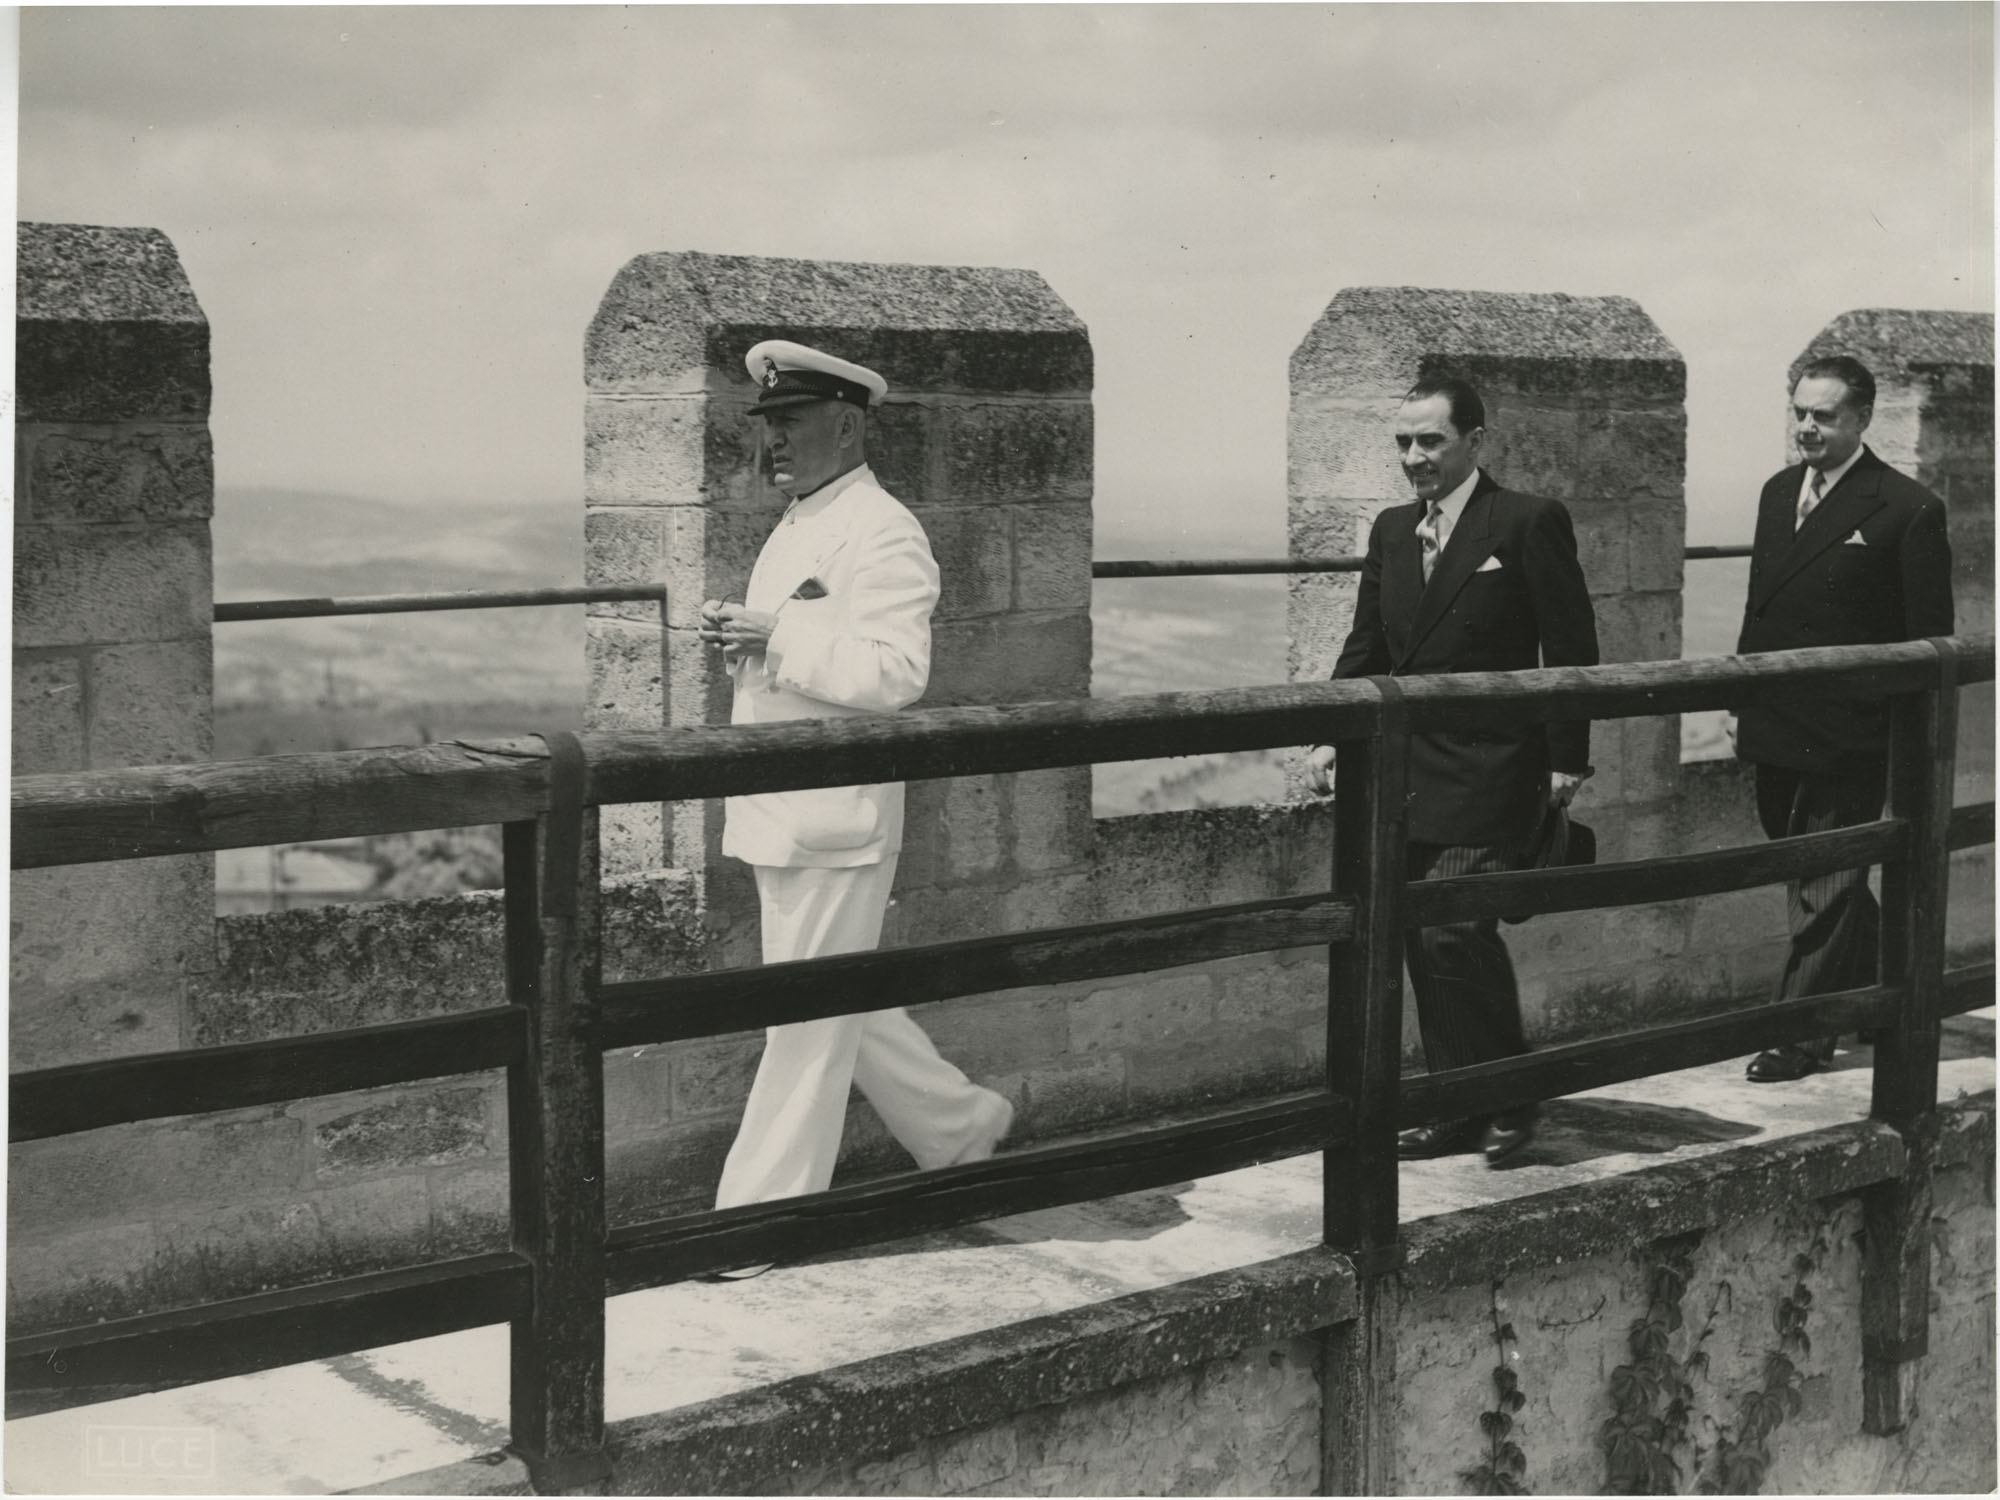 Mihai Antonescu's visit to Benito Mussolini, Photograph 47